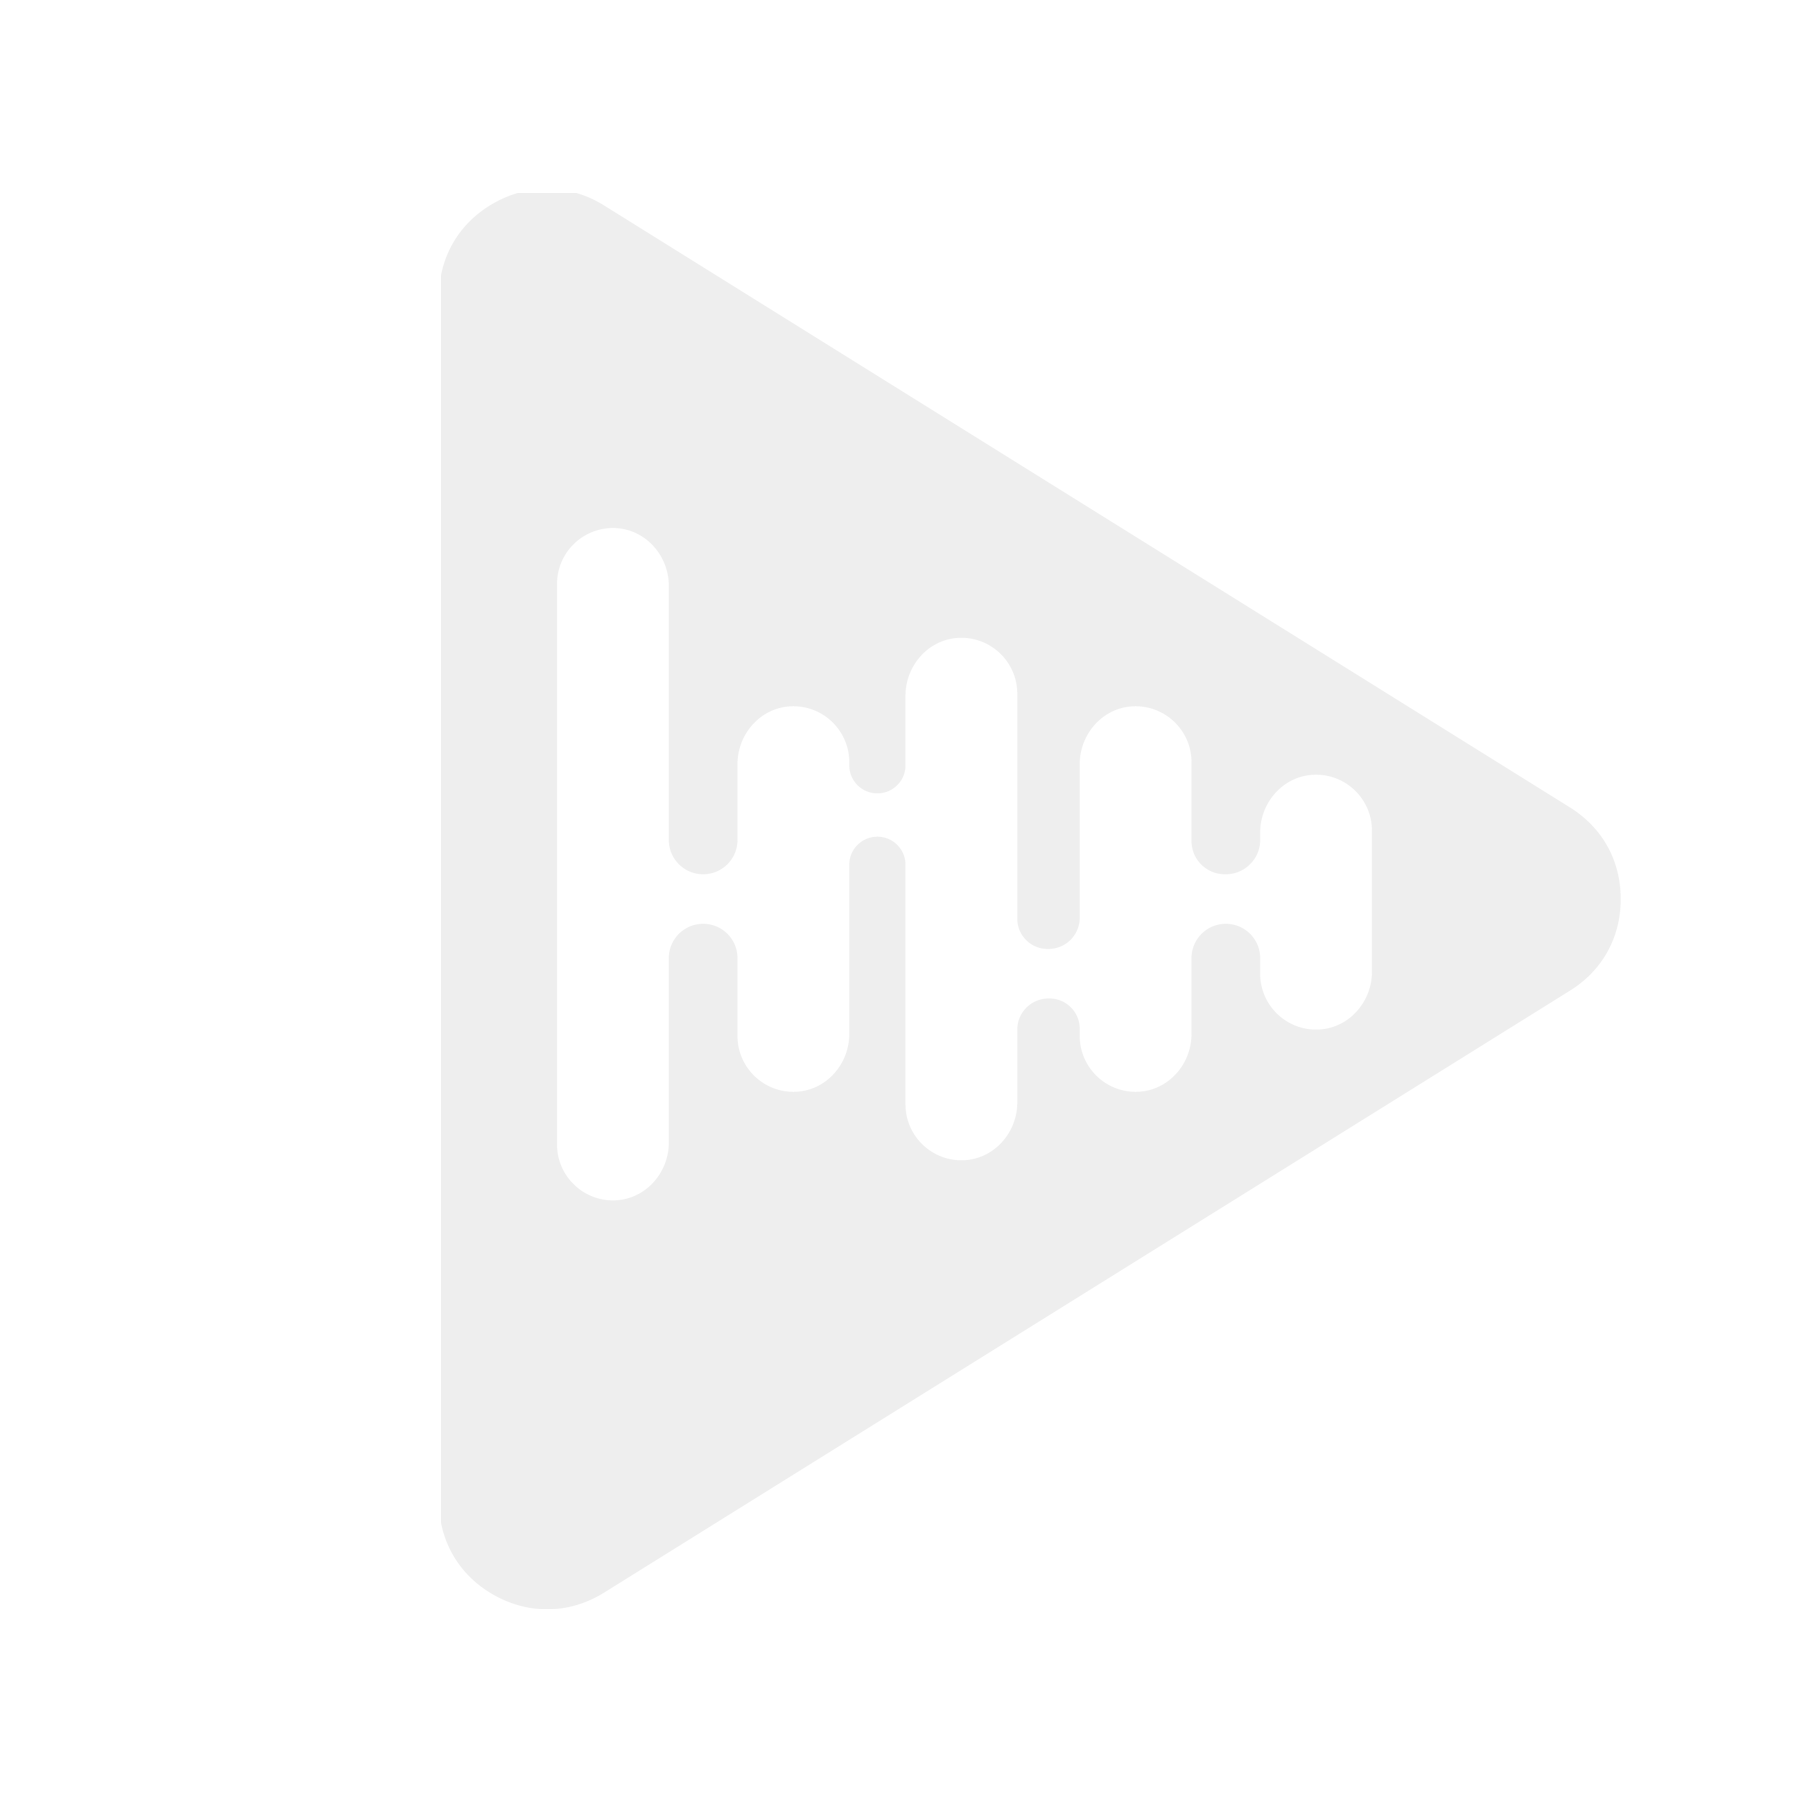 Connect C0001-ST12V - 12V spenningsregulator